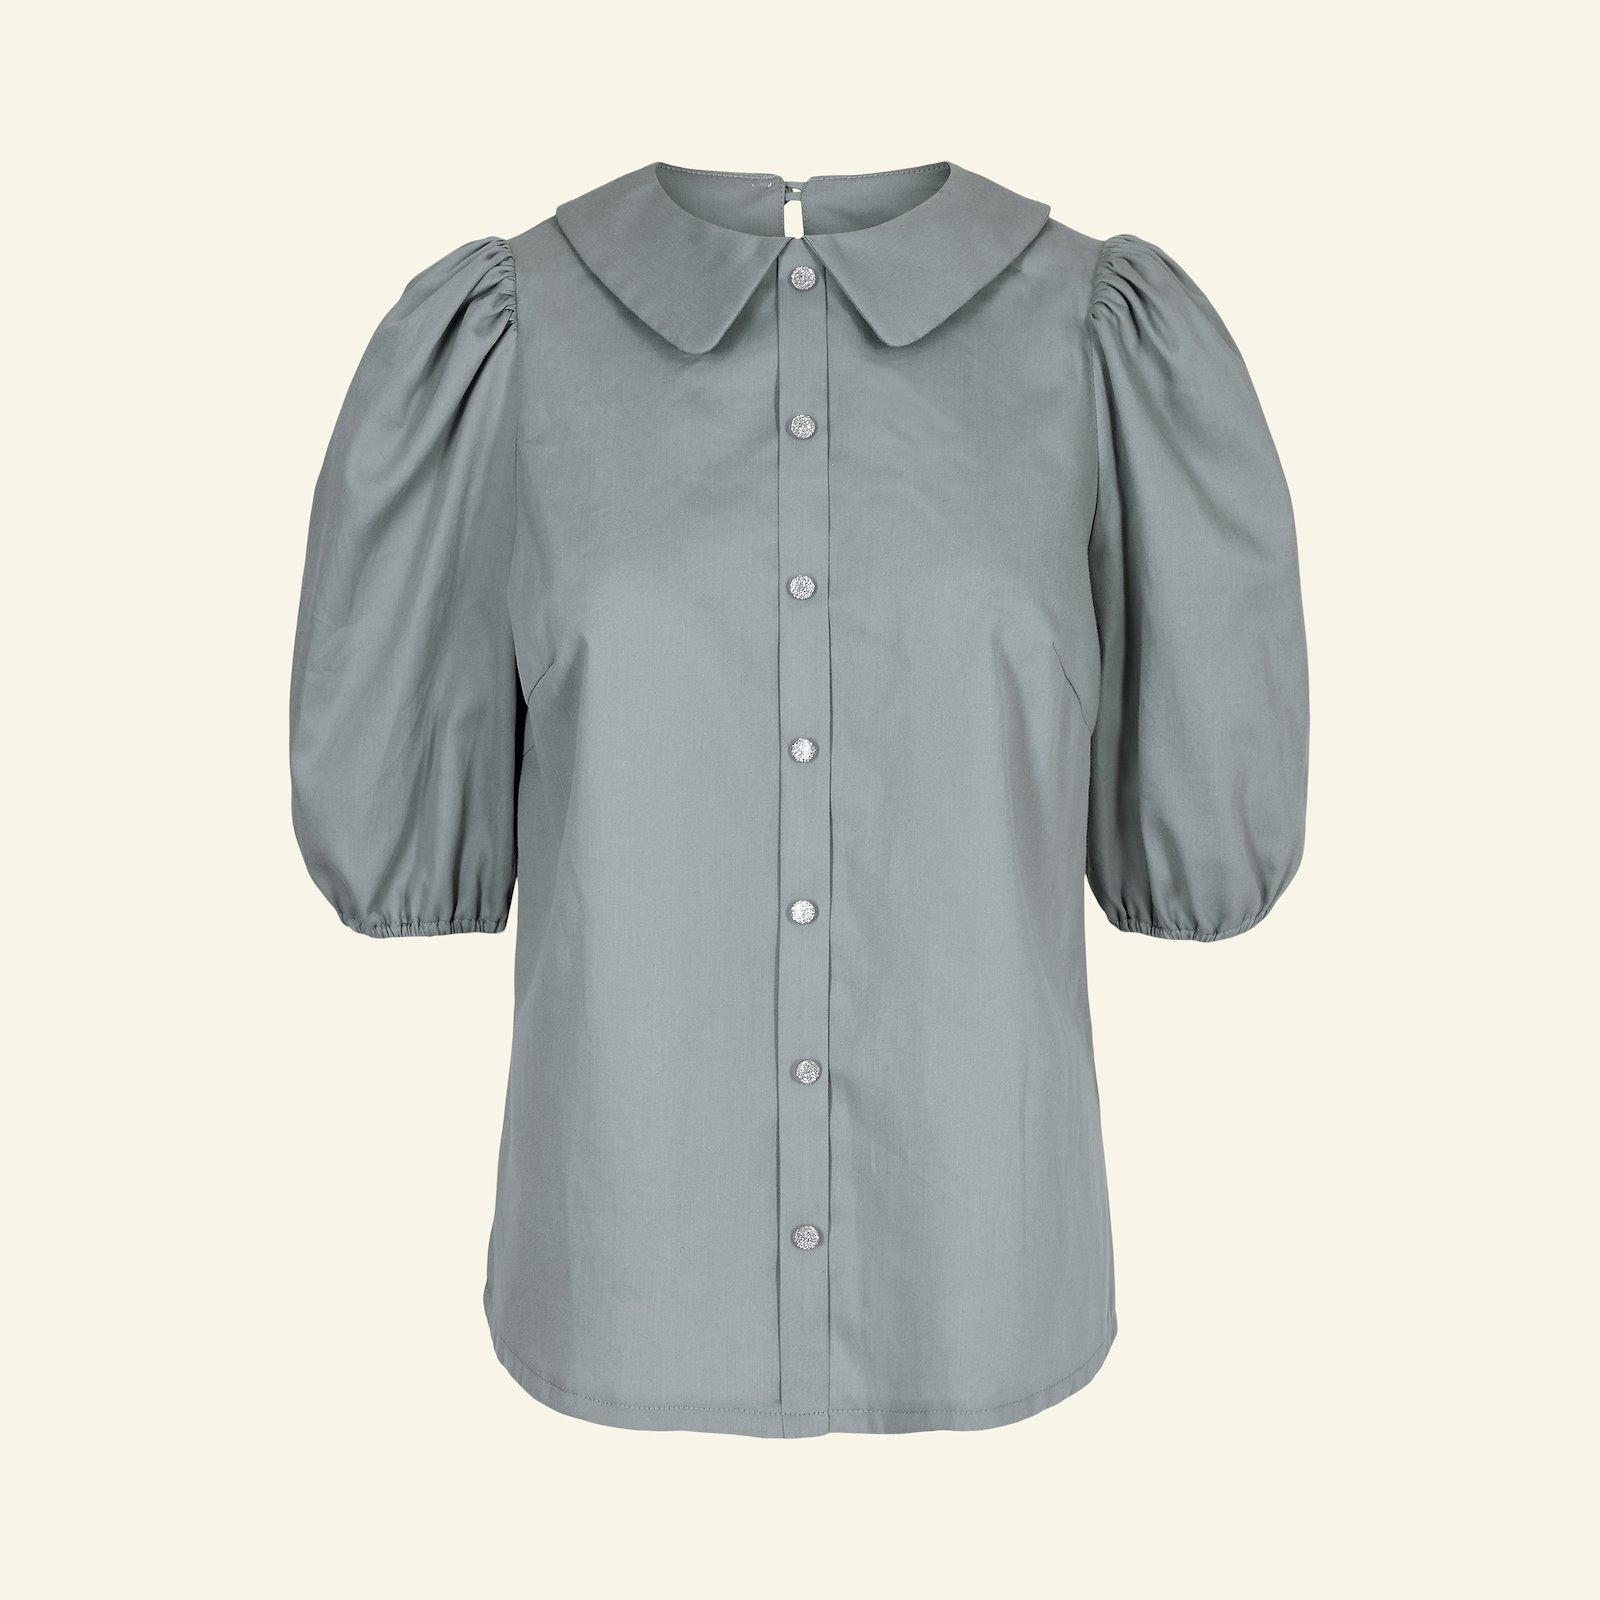 Design your own blouse, 46/18 p22075_816252_40589_sskit